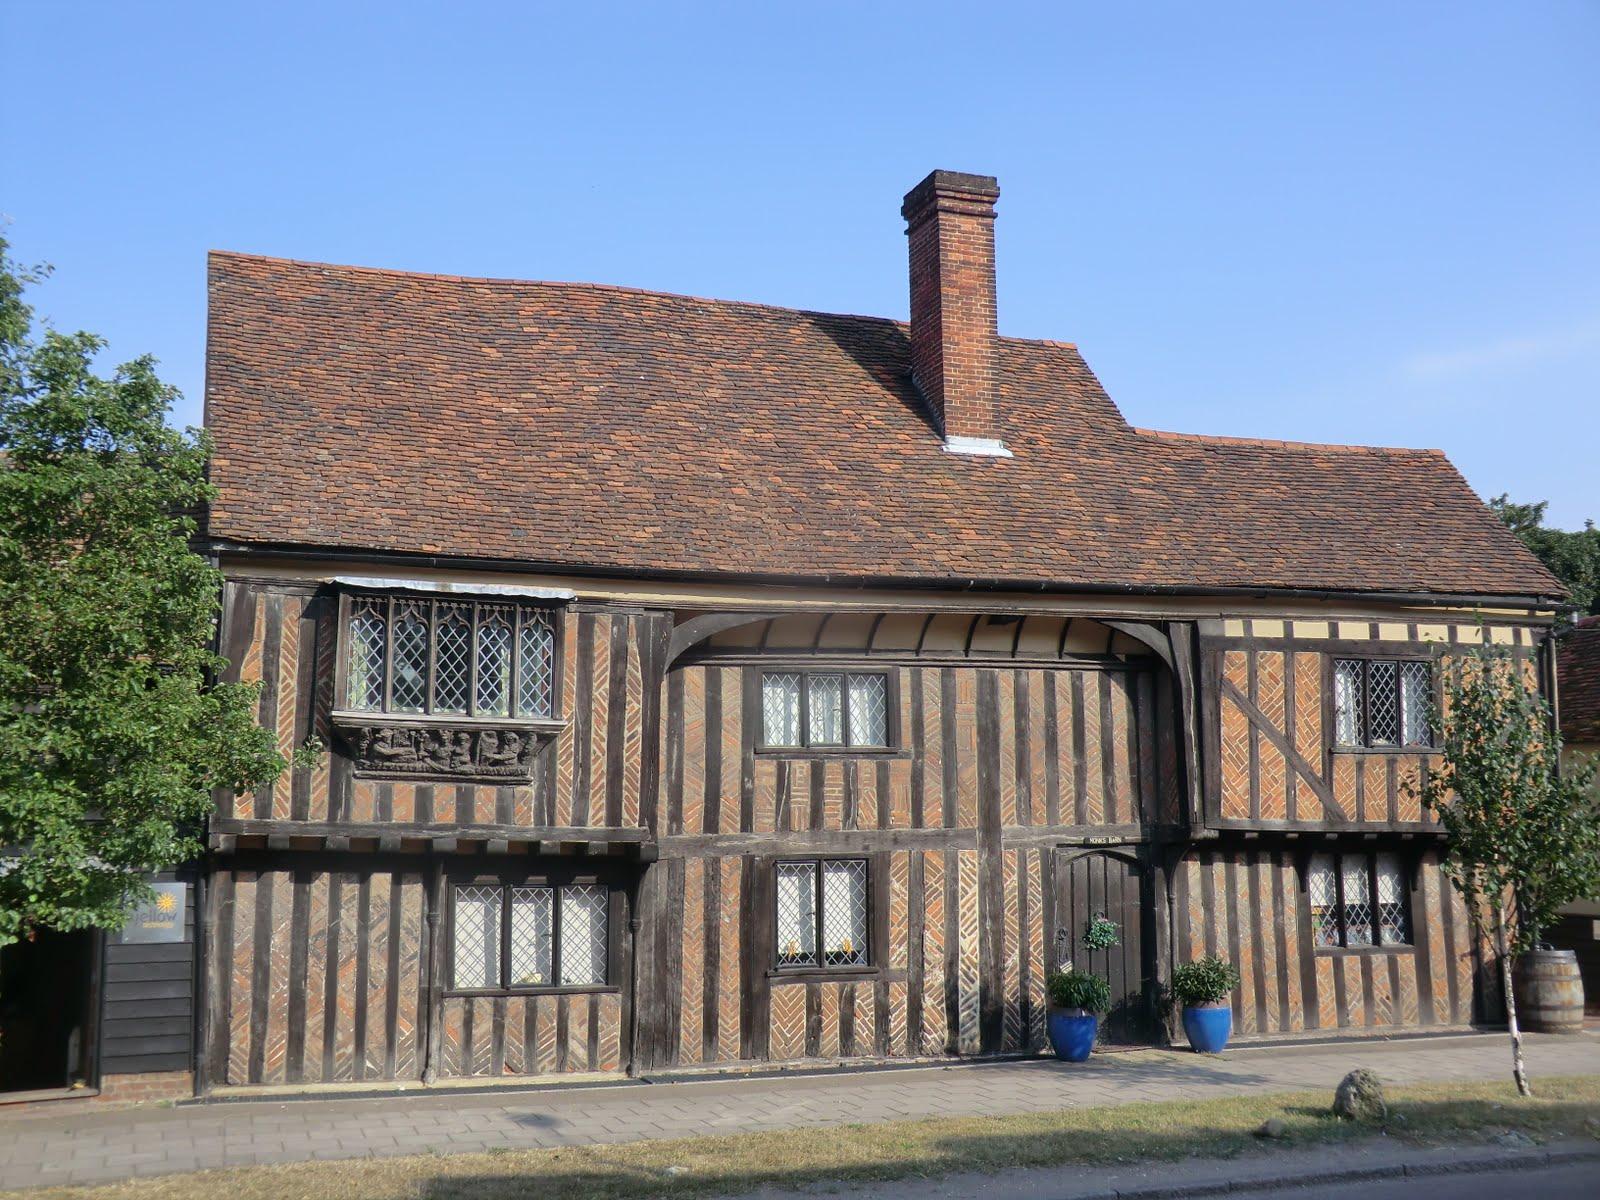 CIMG6083 Monk's Barn, Newport